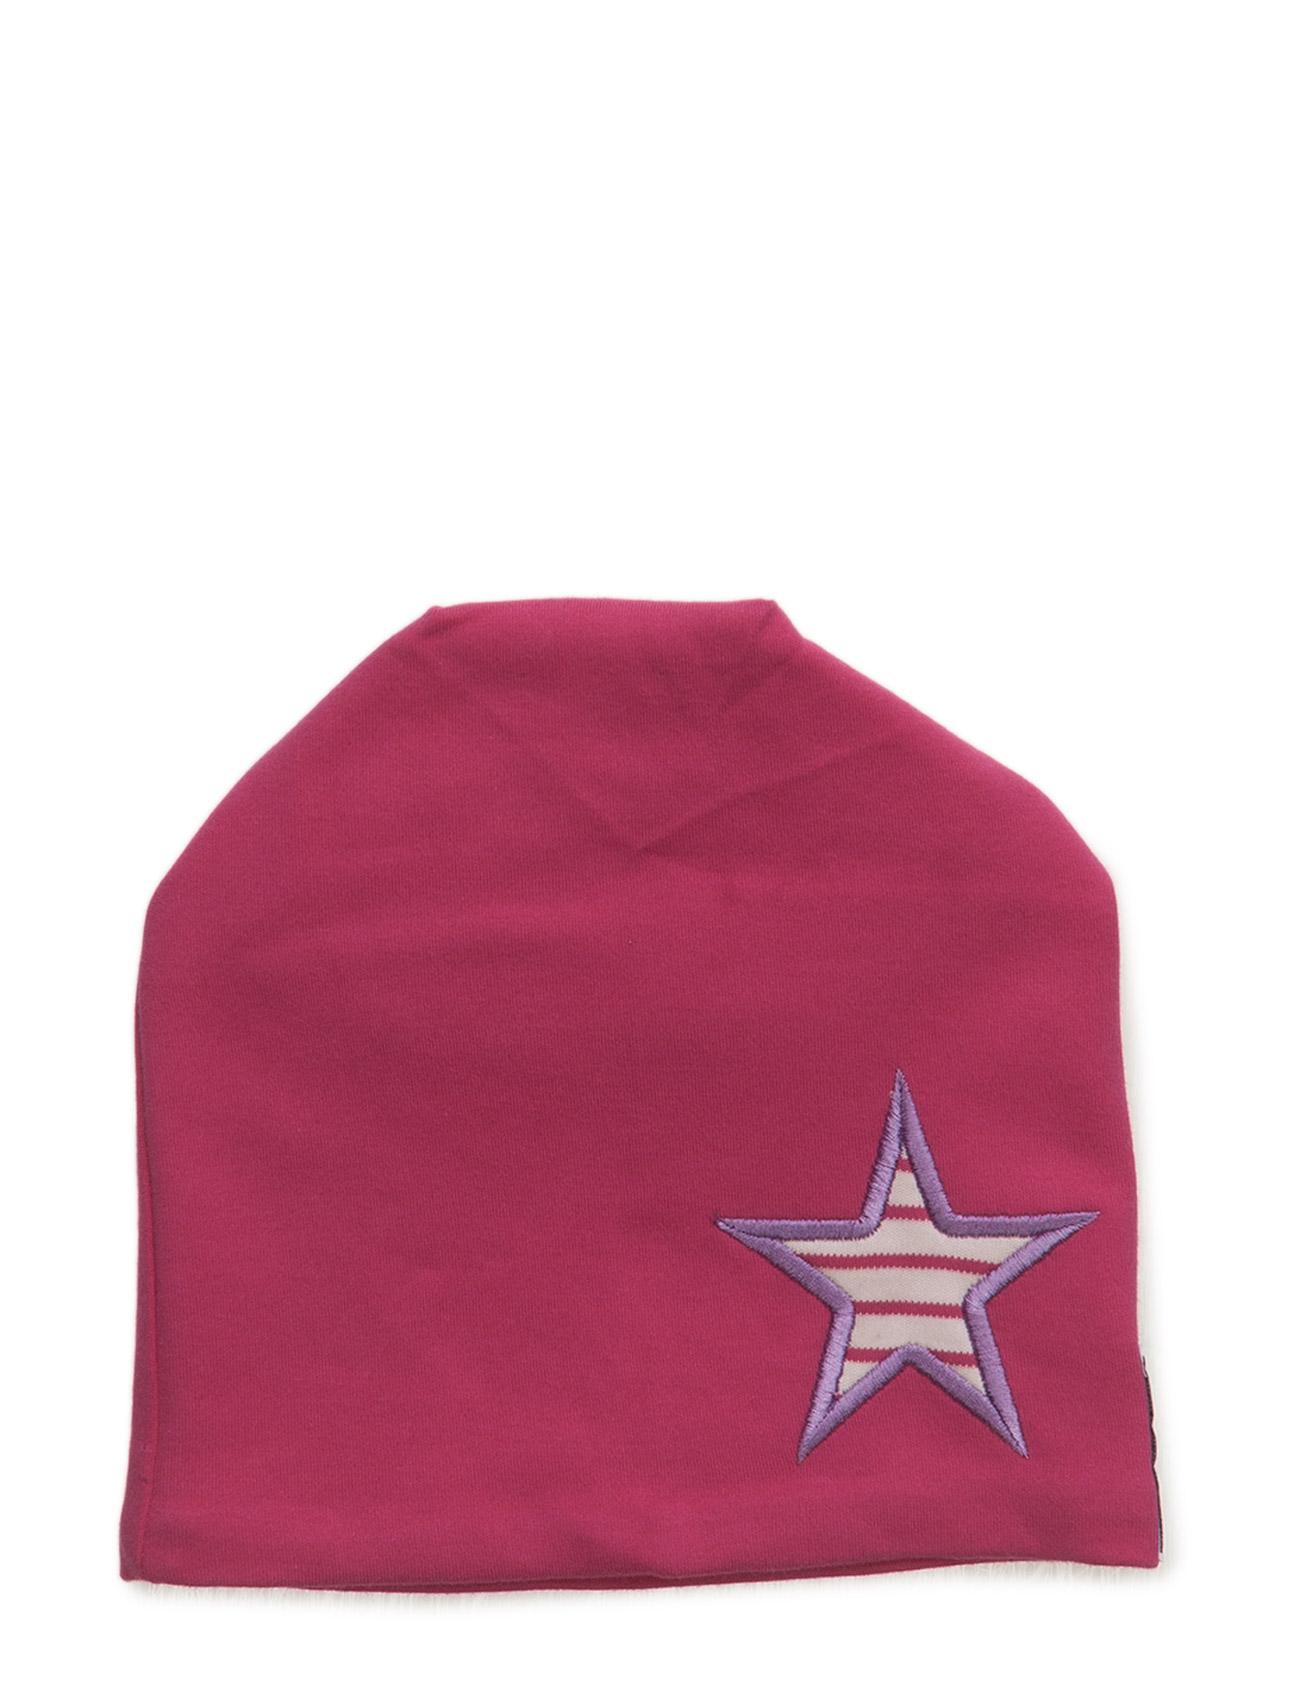 Star Cap Geggamoja Hatte & Caps til Børn i